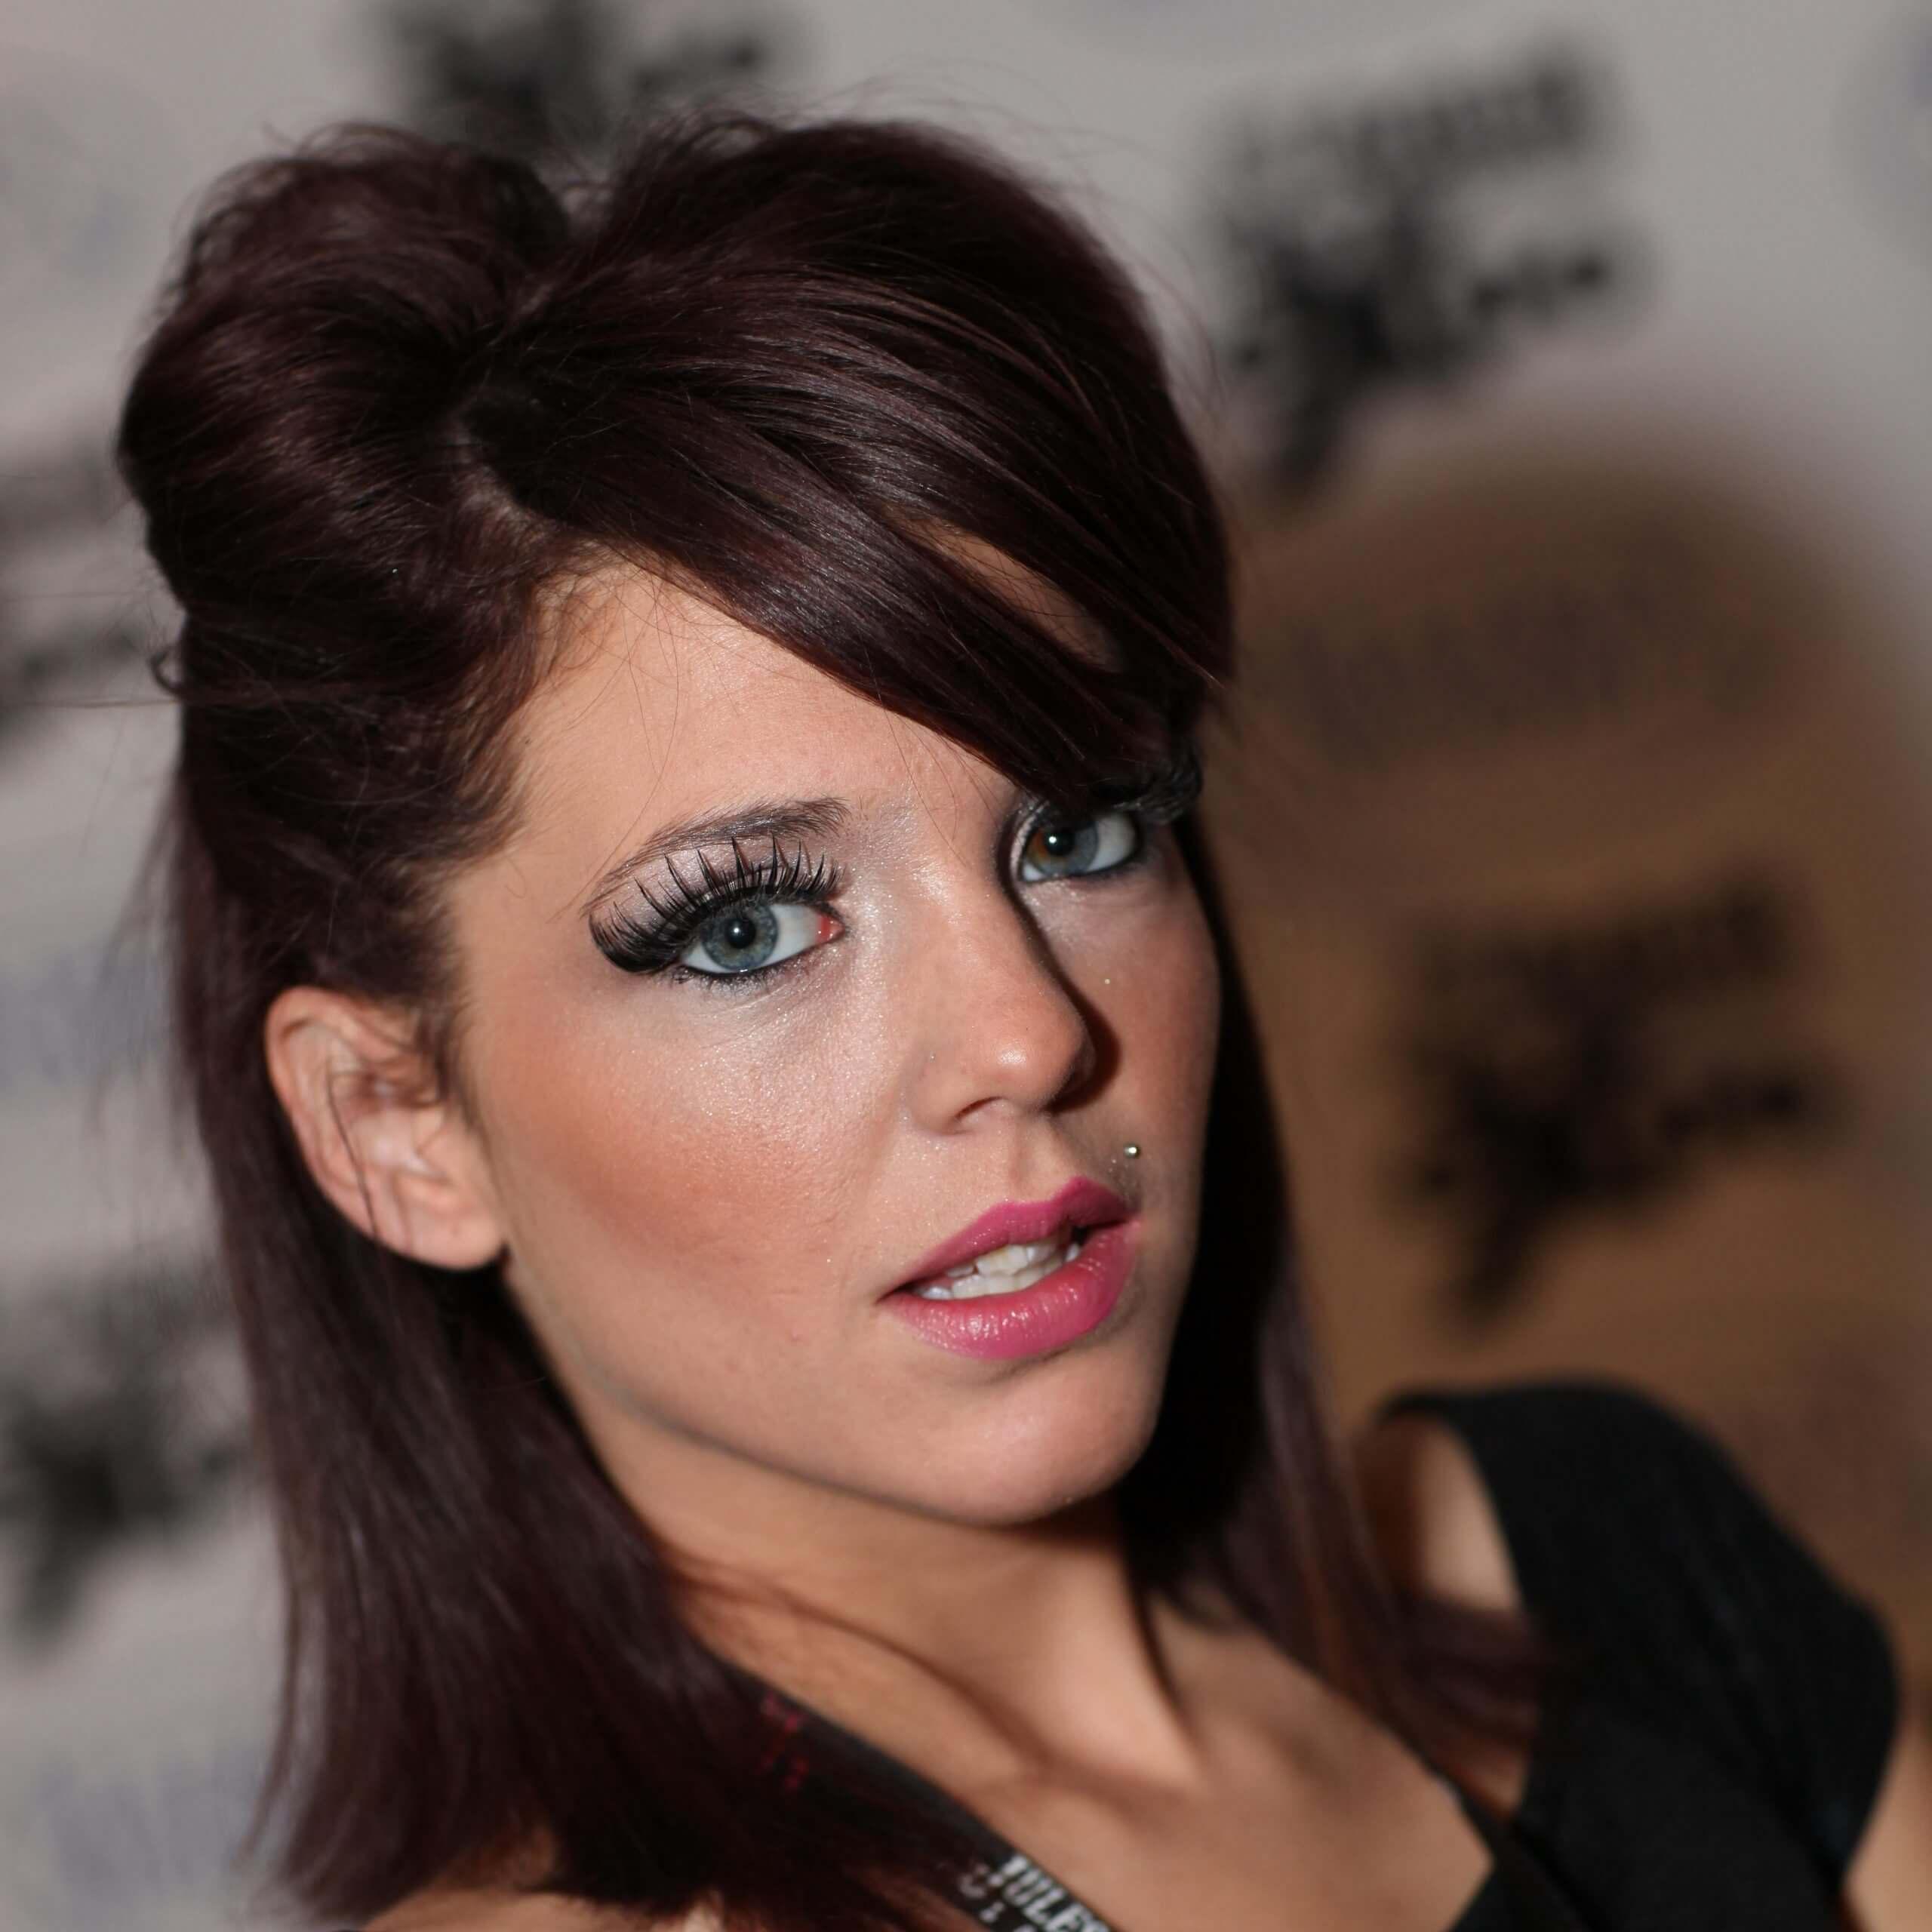 Kiera Winters 2013 AVN Expo Photos Las Vegas